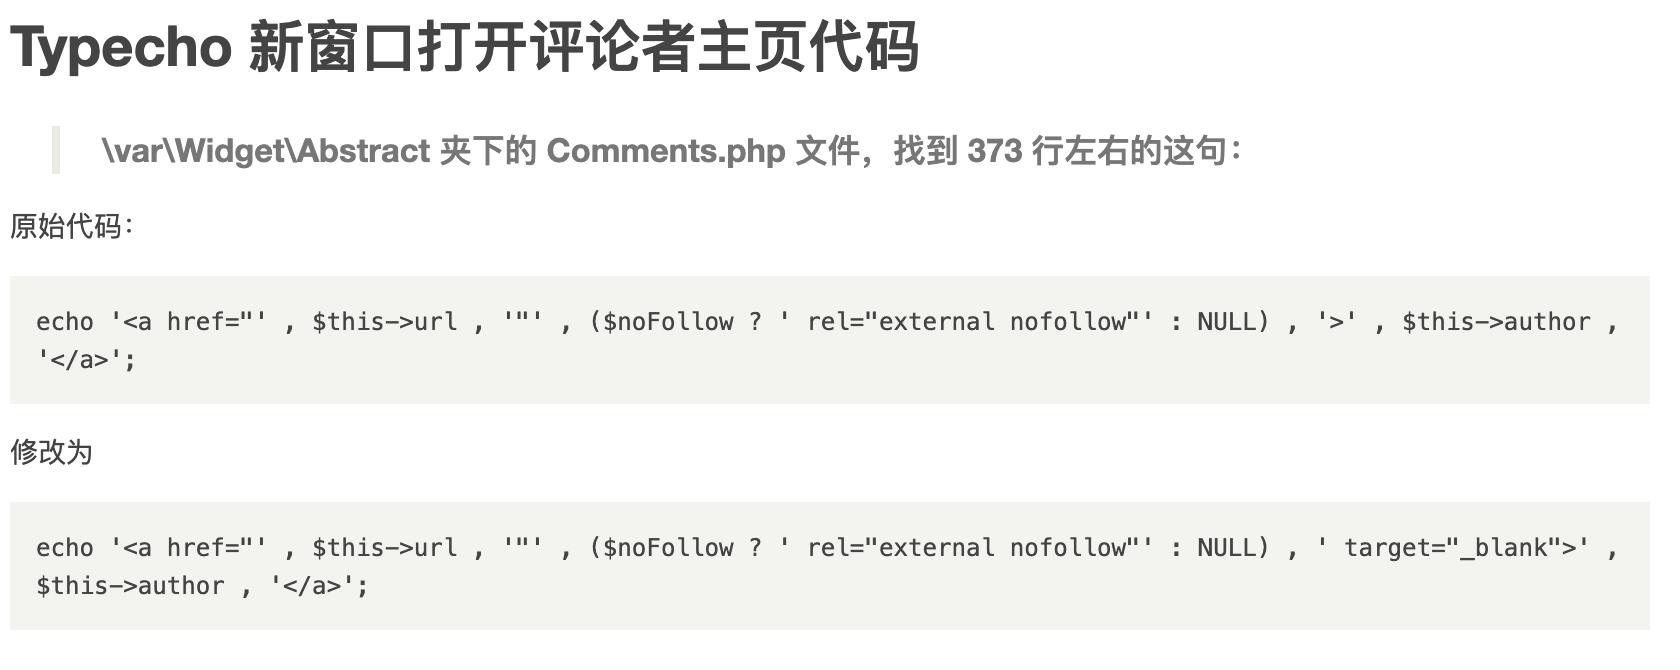 #Typecho 新窗口打开评论者主页代码